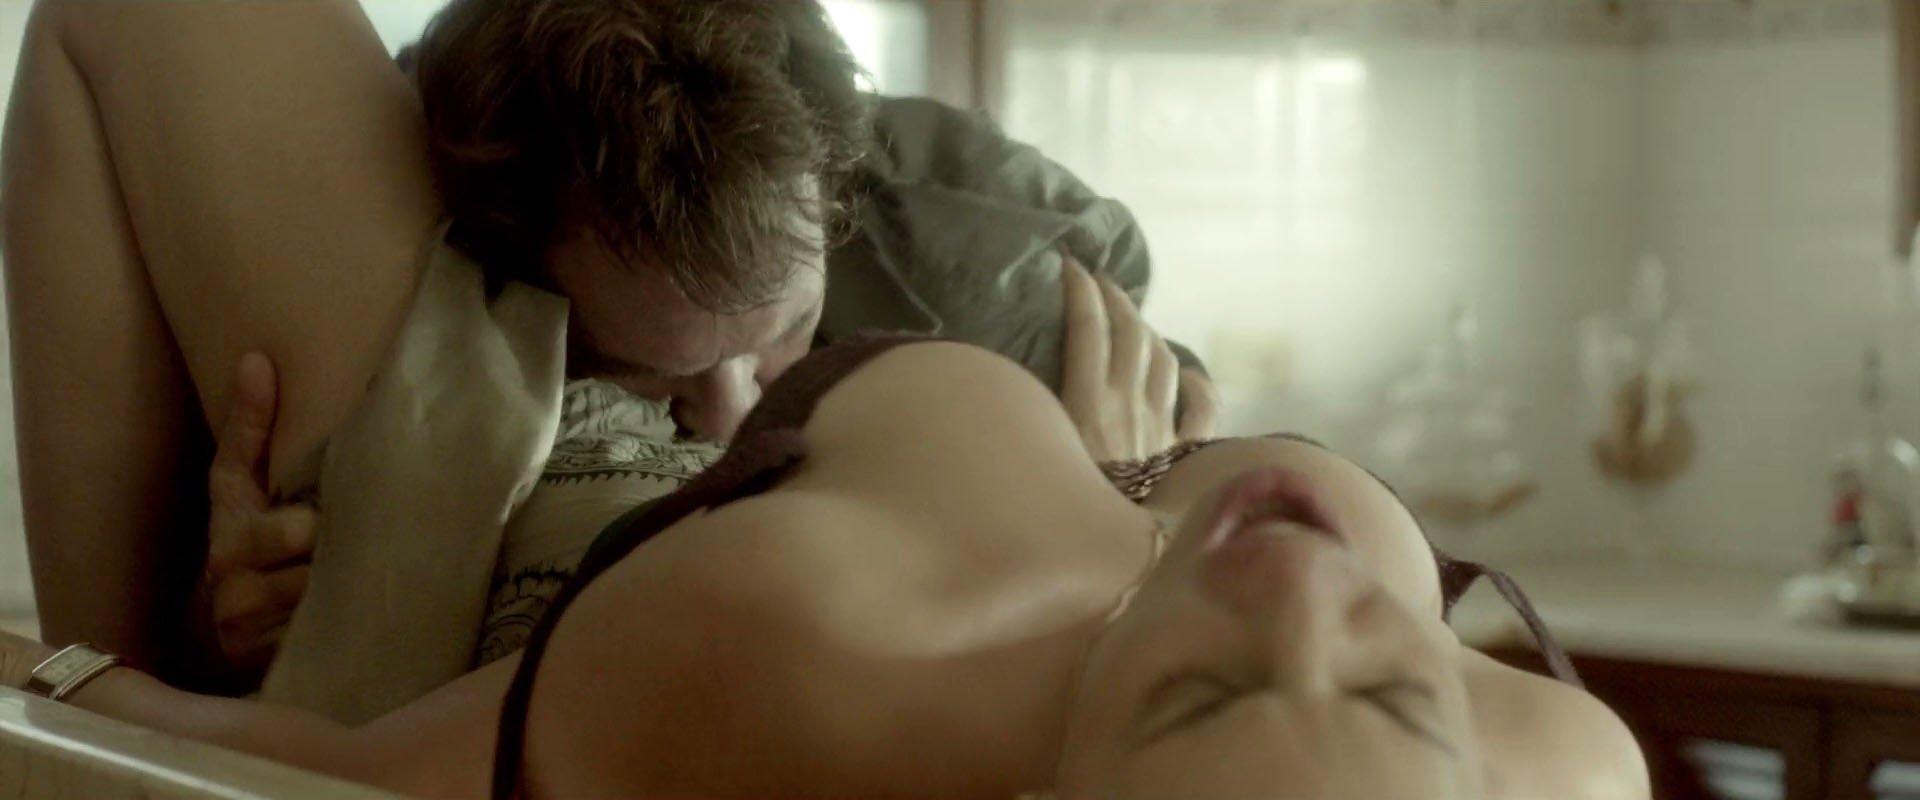 Laura Ramos  nackt